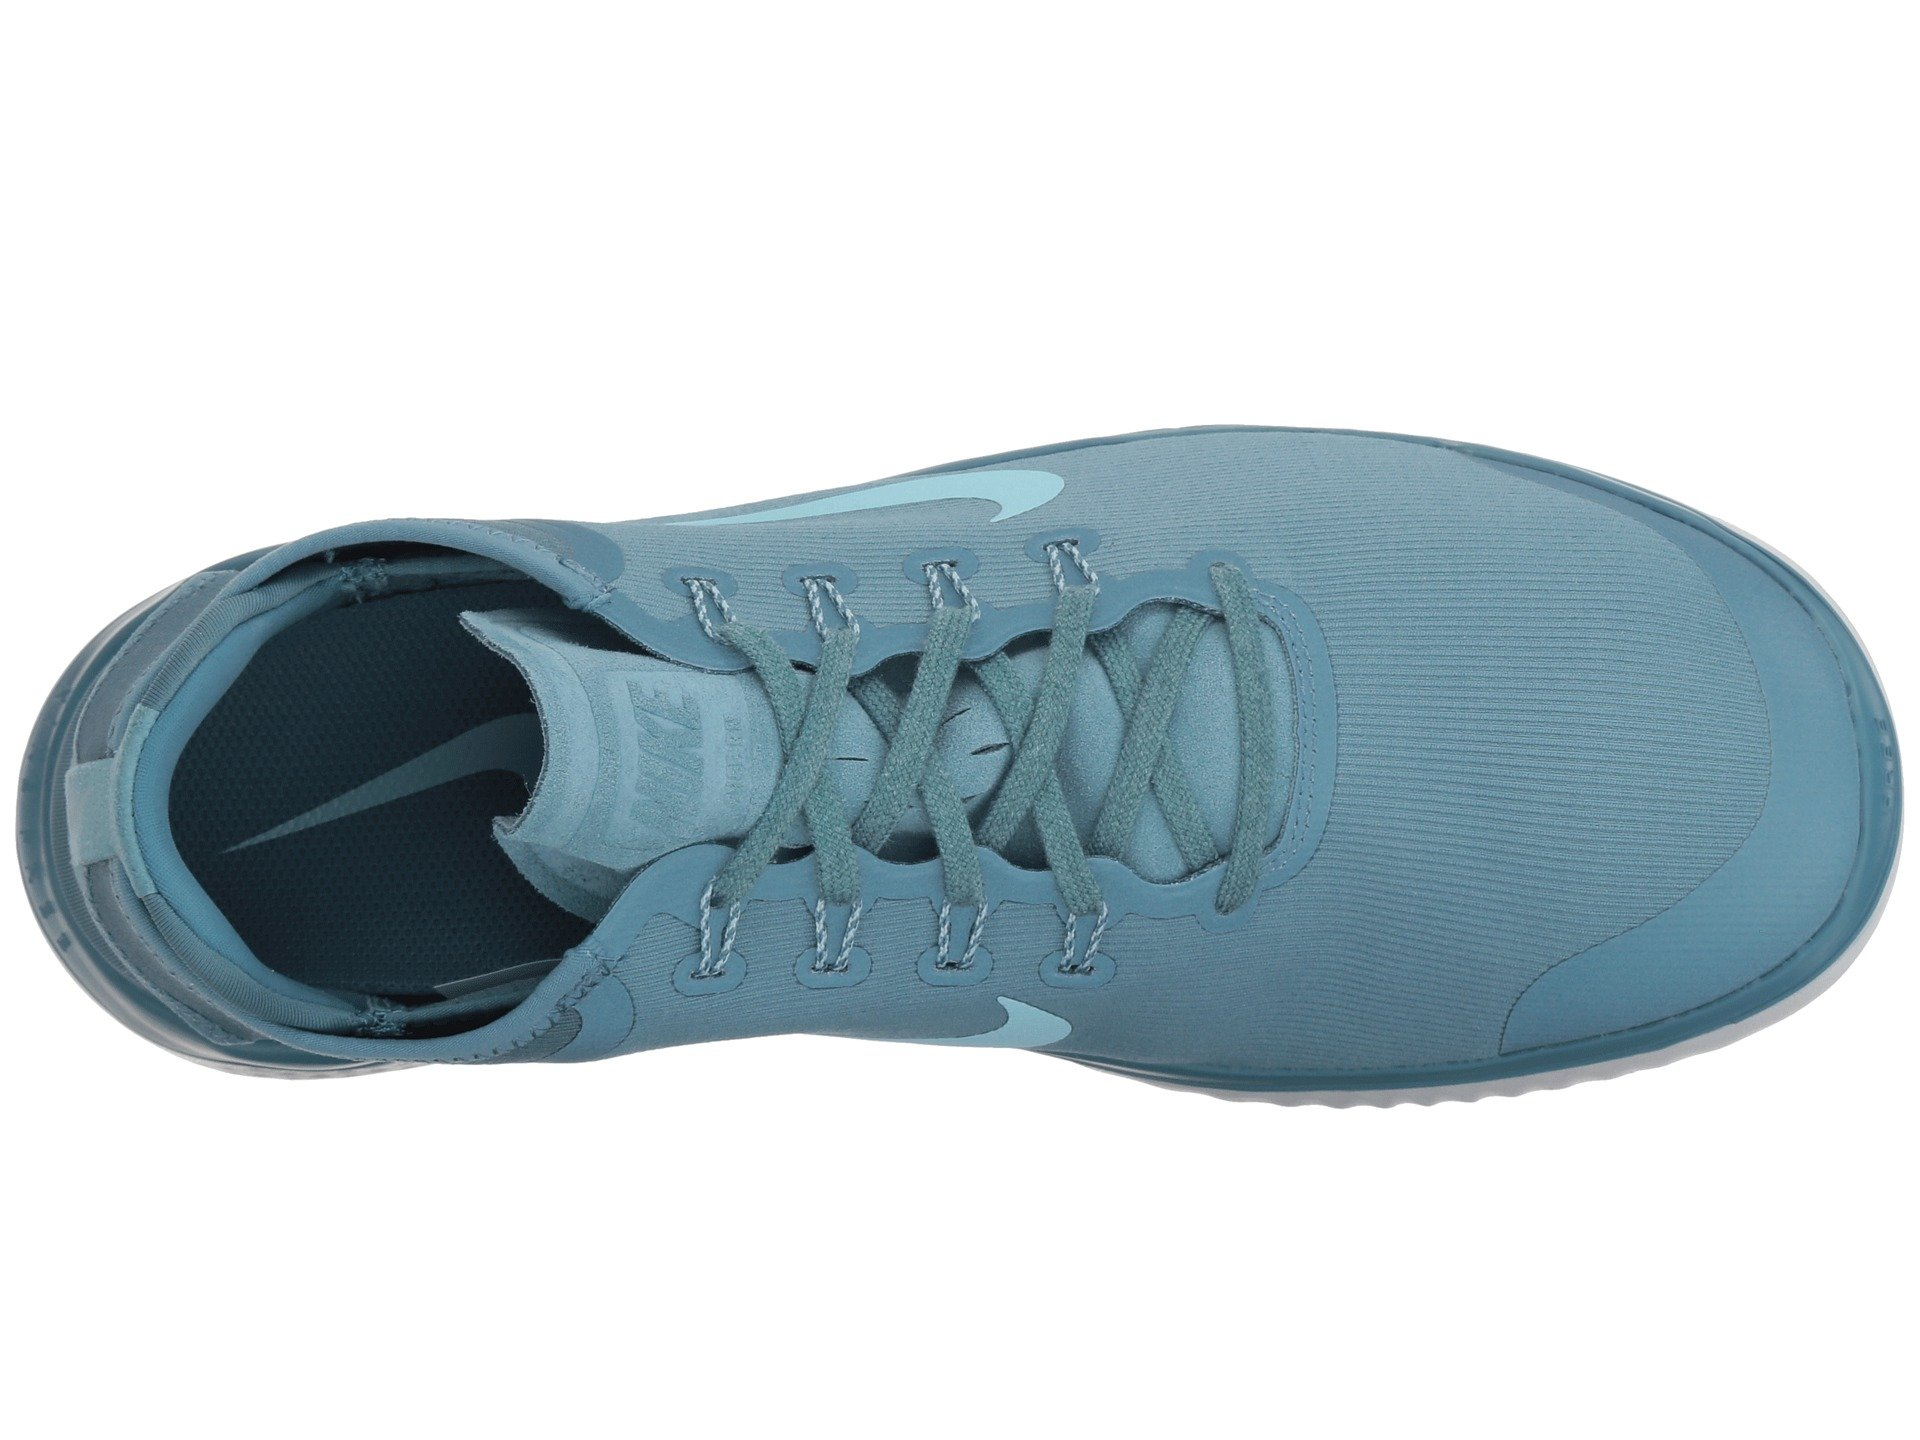 Nike Free RN 2018 Sun Running Shoe (8 D(M) US, Noise Aqua/Pure Platinum) by Nike (Image #9)